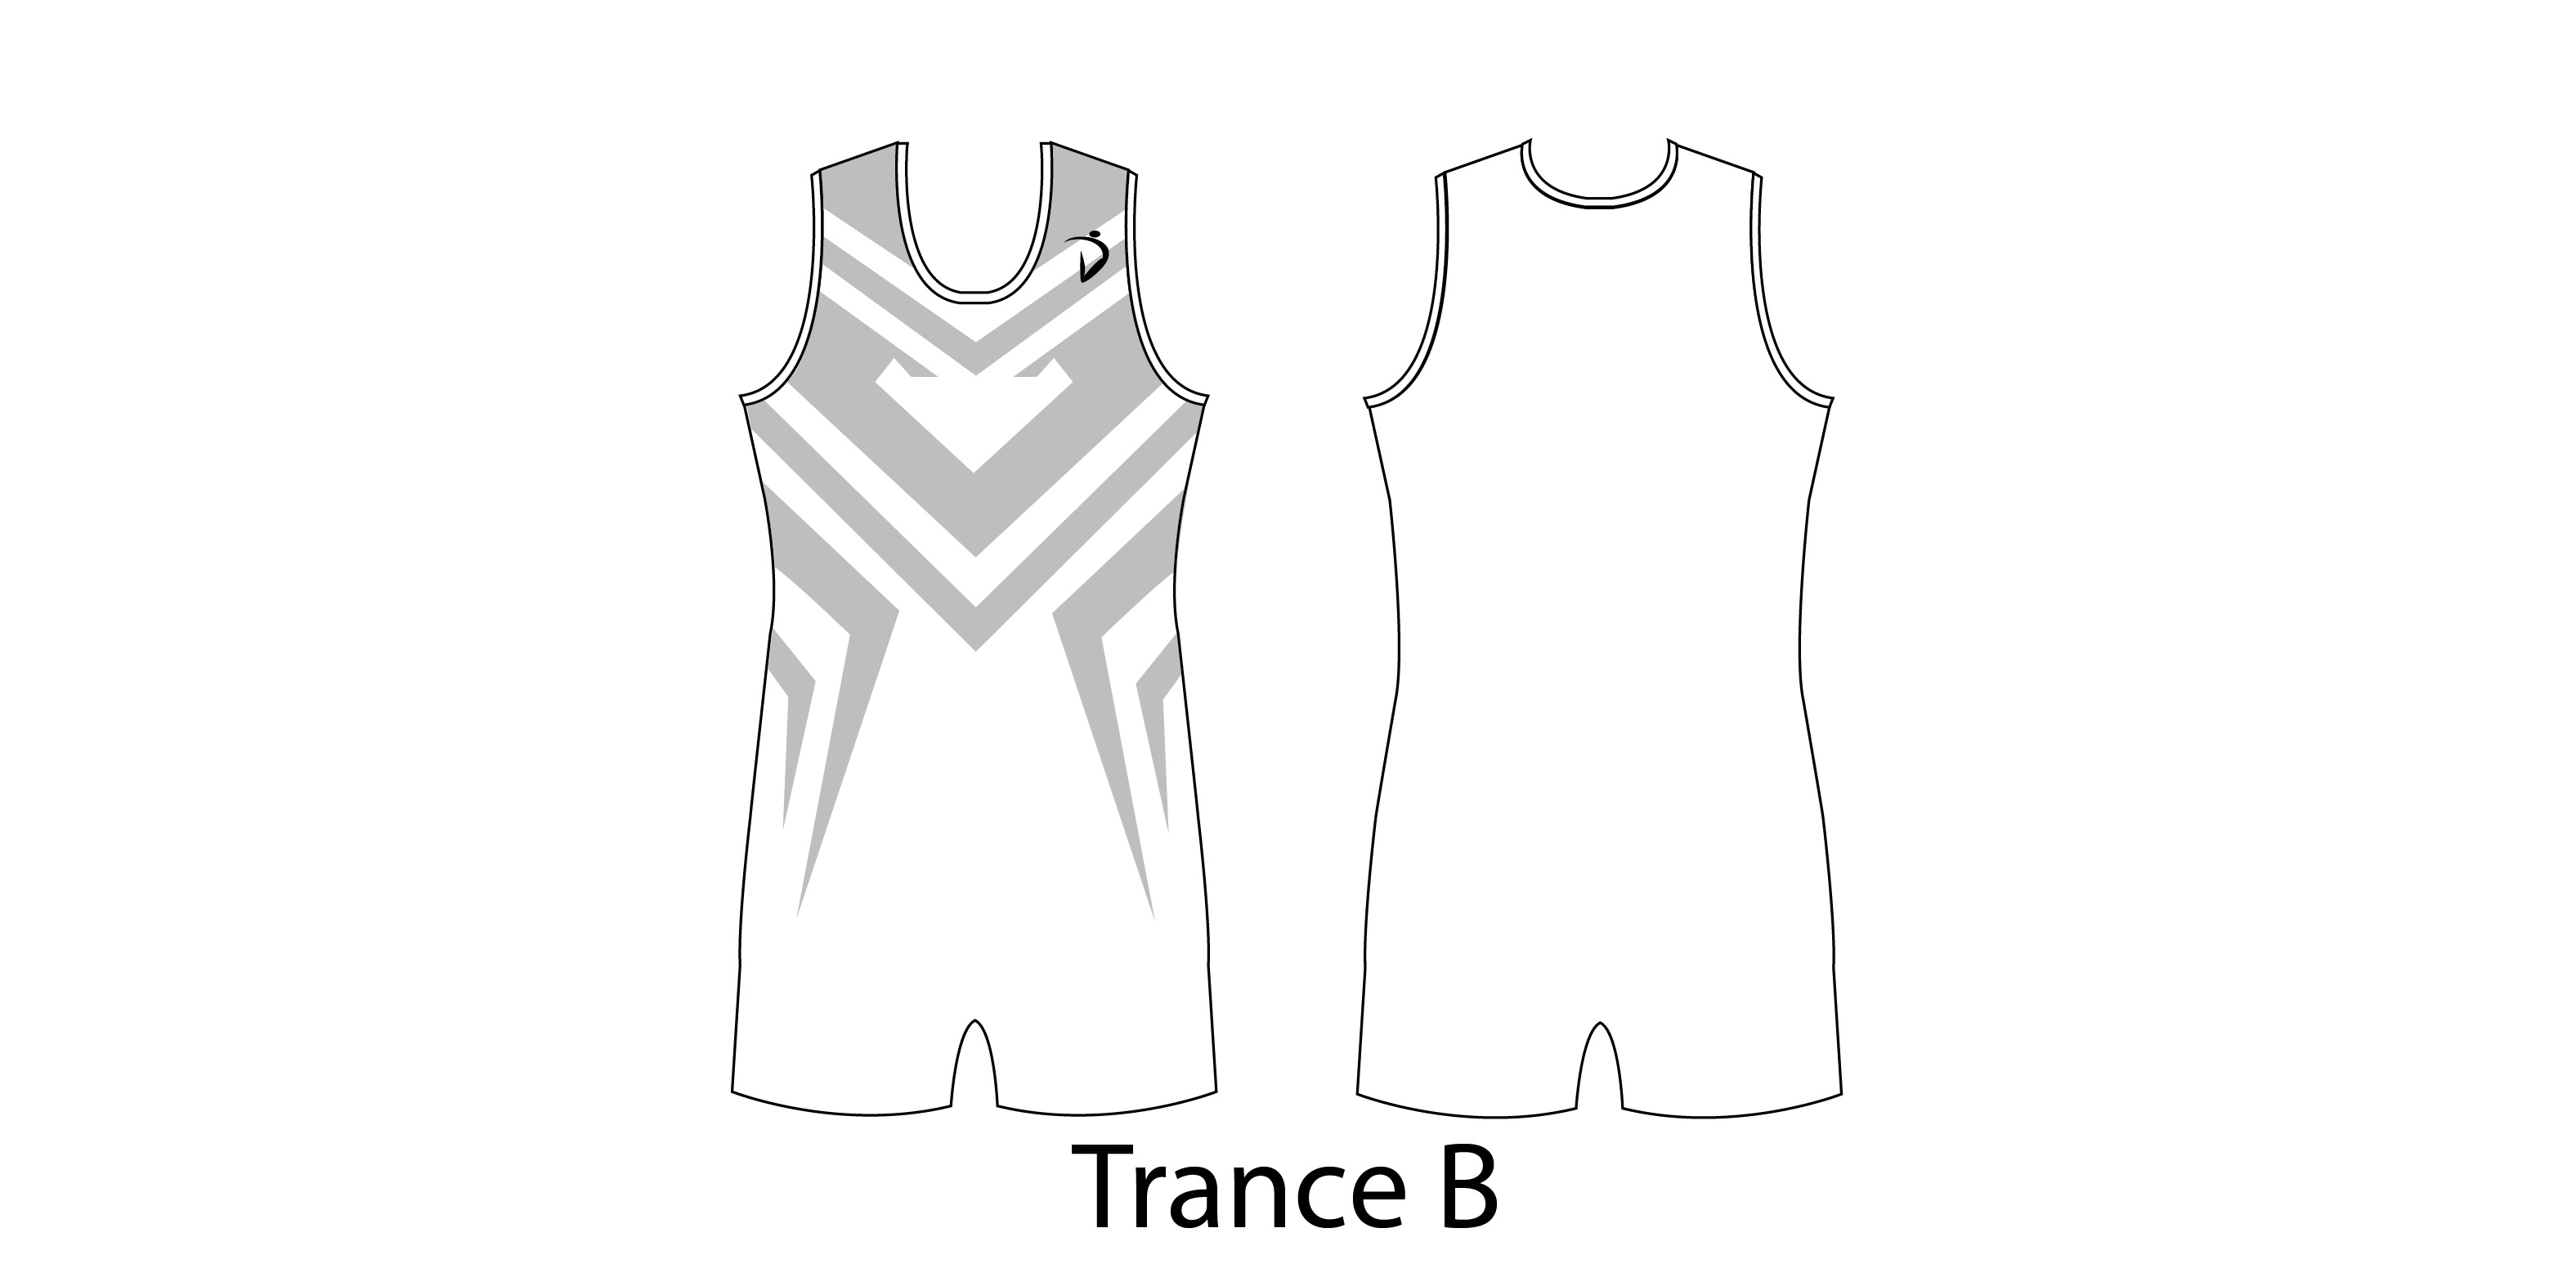 Trance B